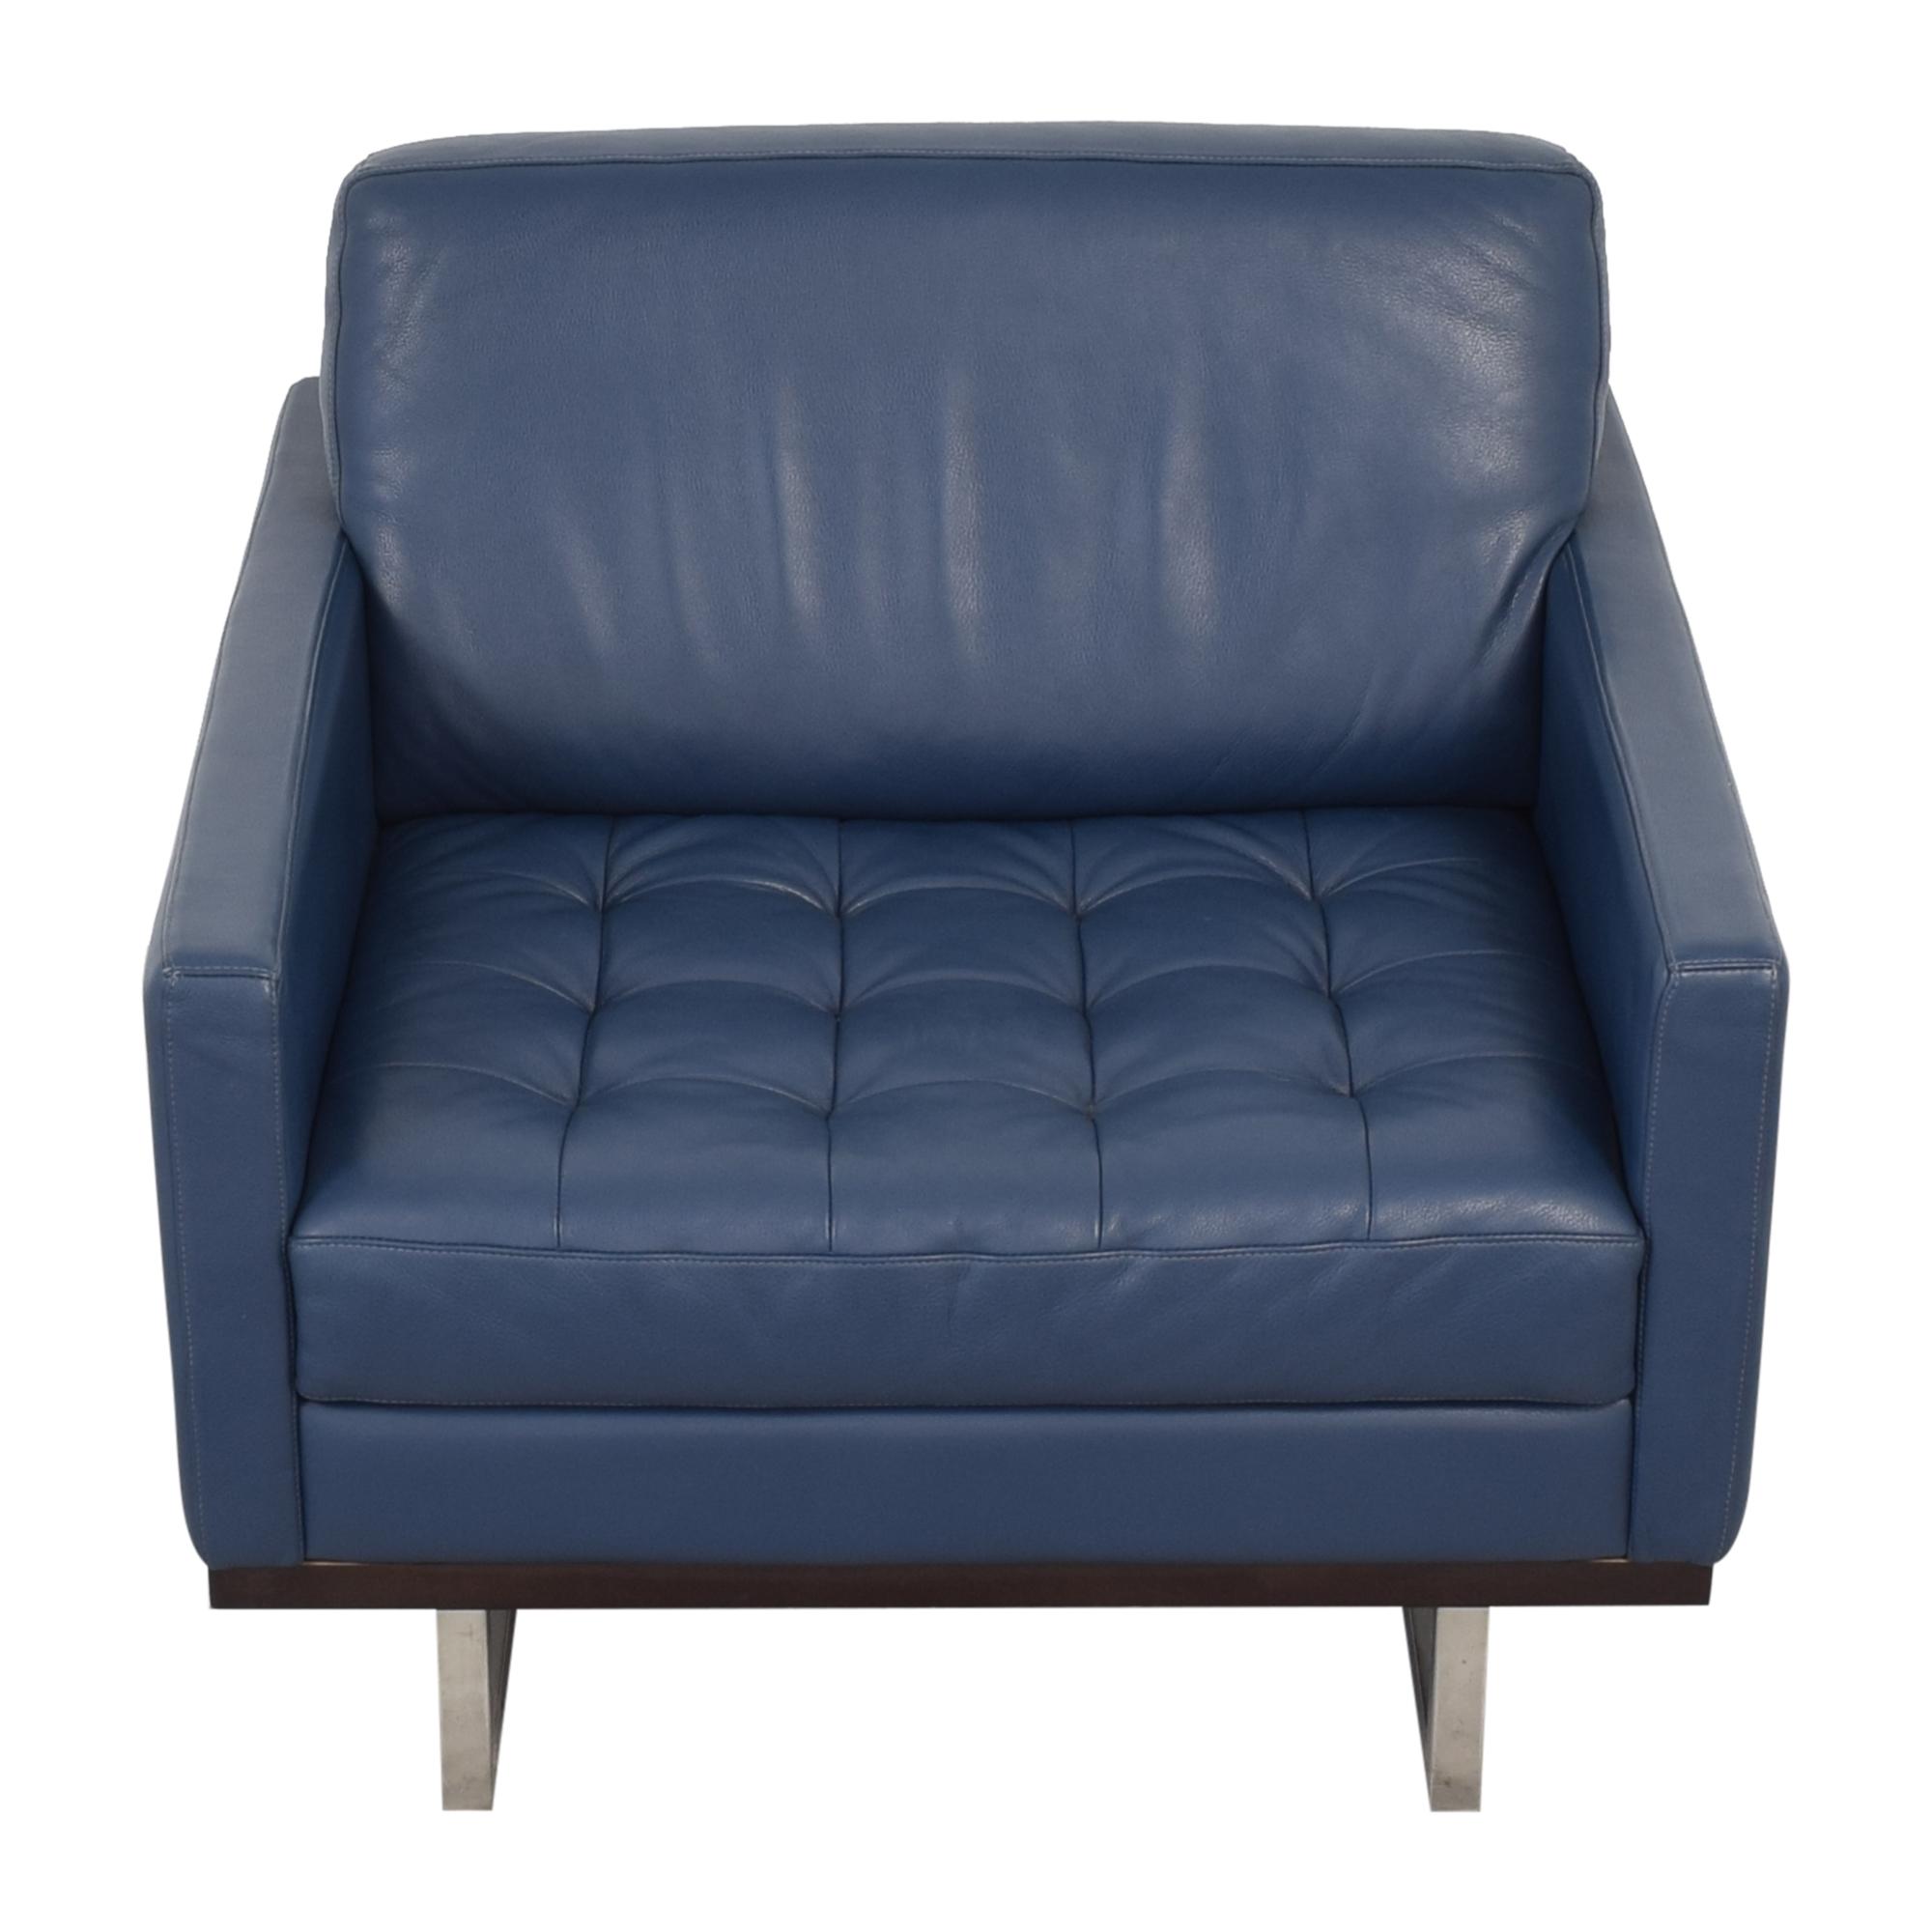 American Leather Tristan Club Chair sale